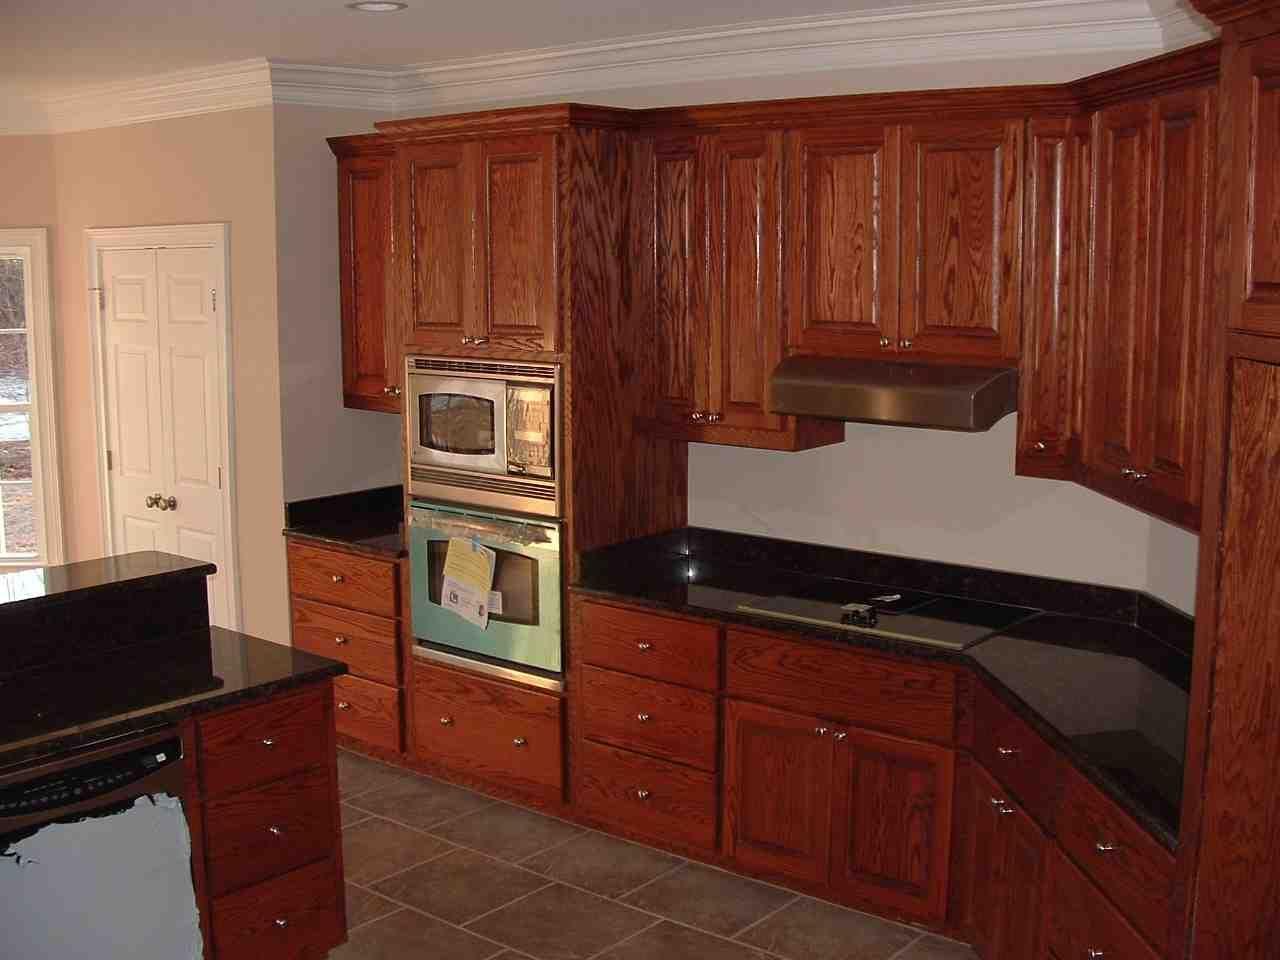 Oak Wood Kitchen Cabinets | Building kitchen cabinets ...